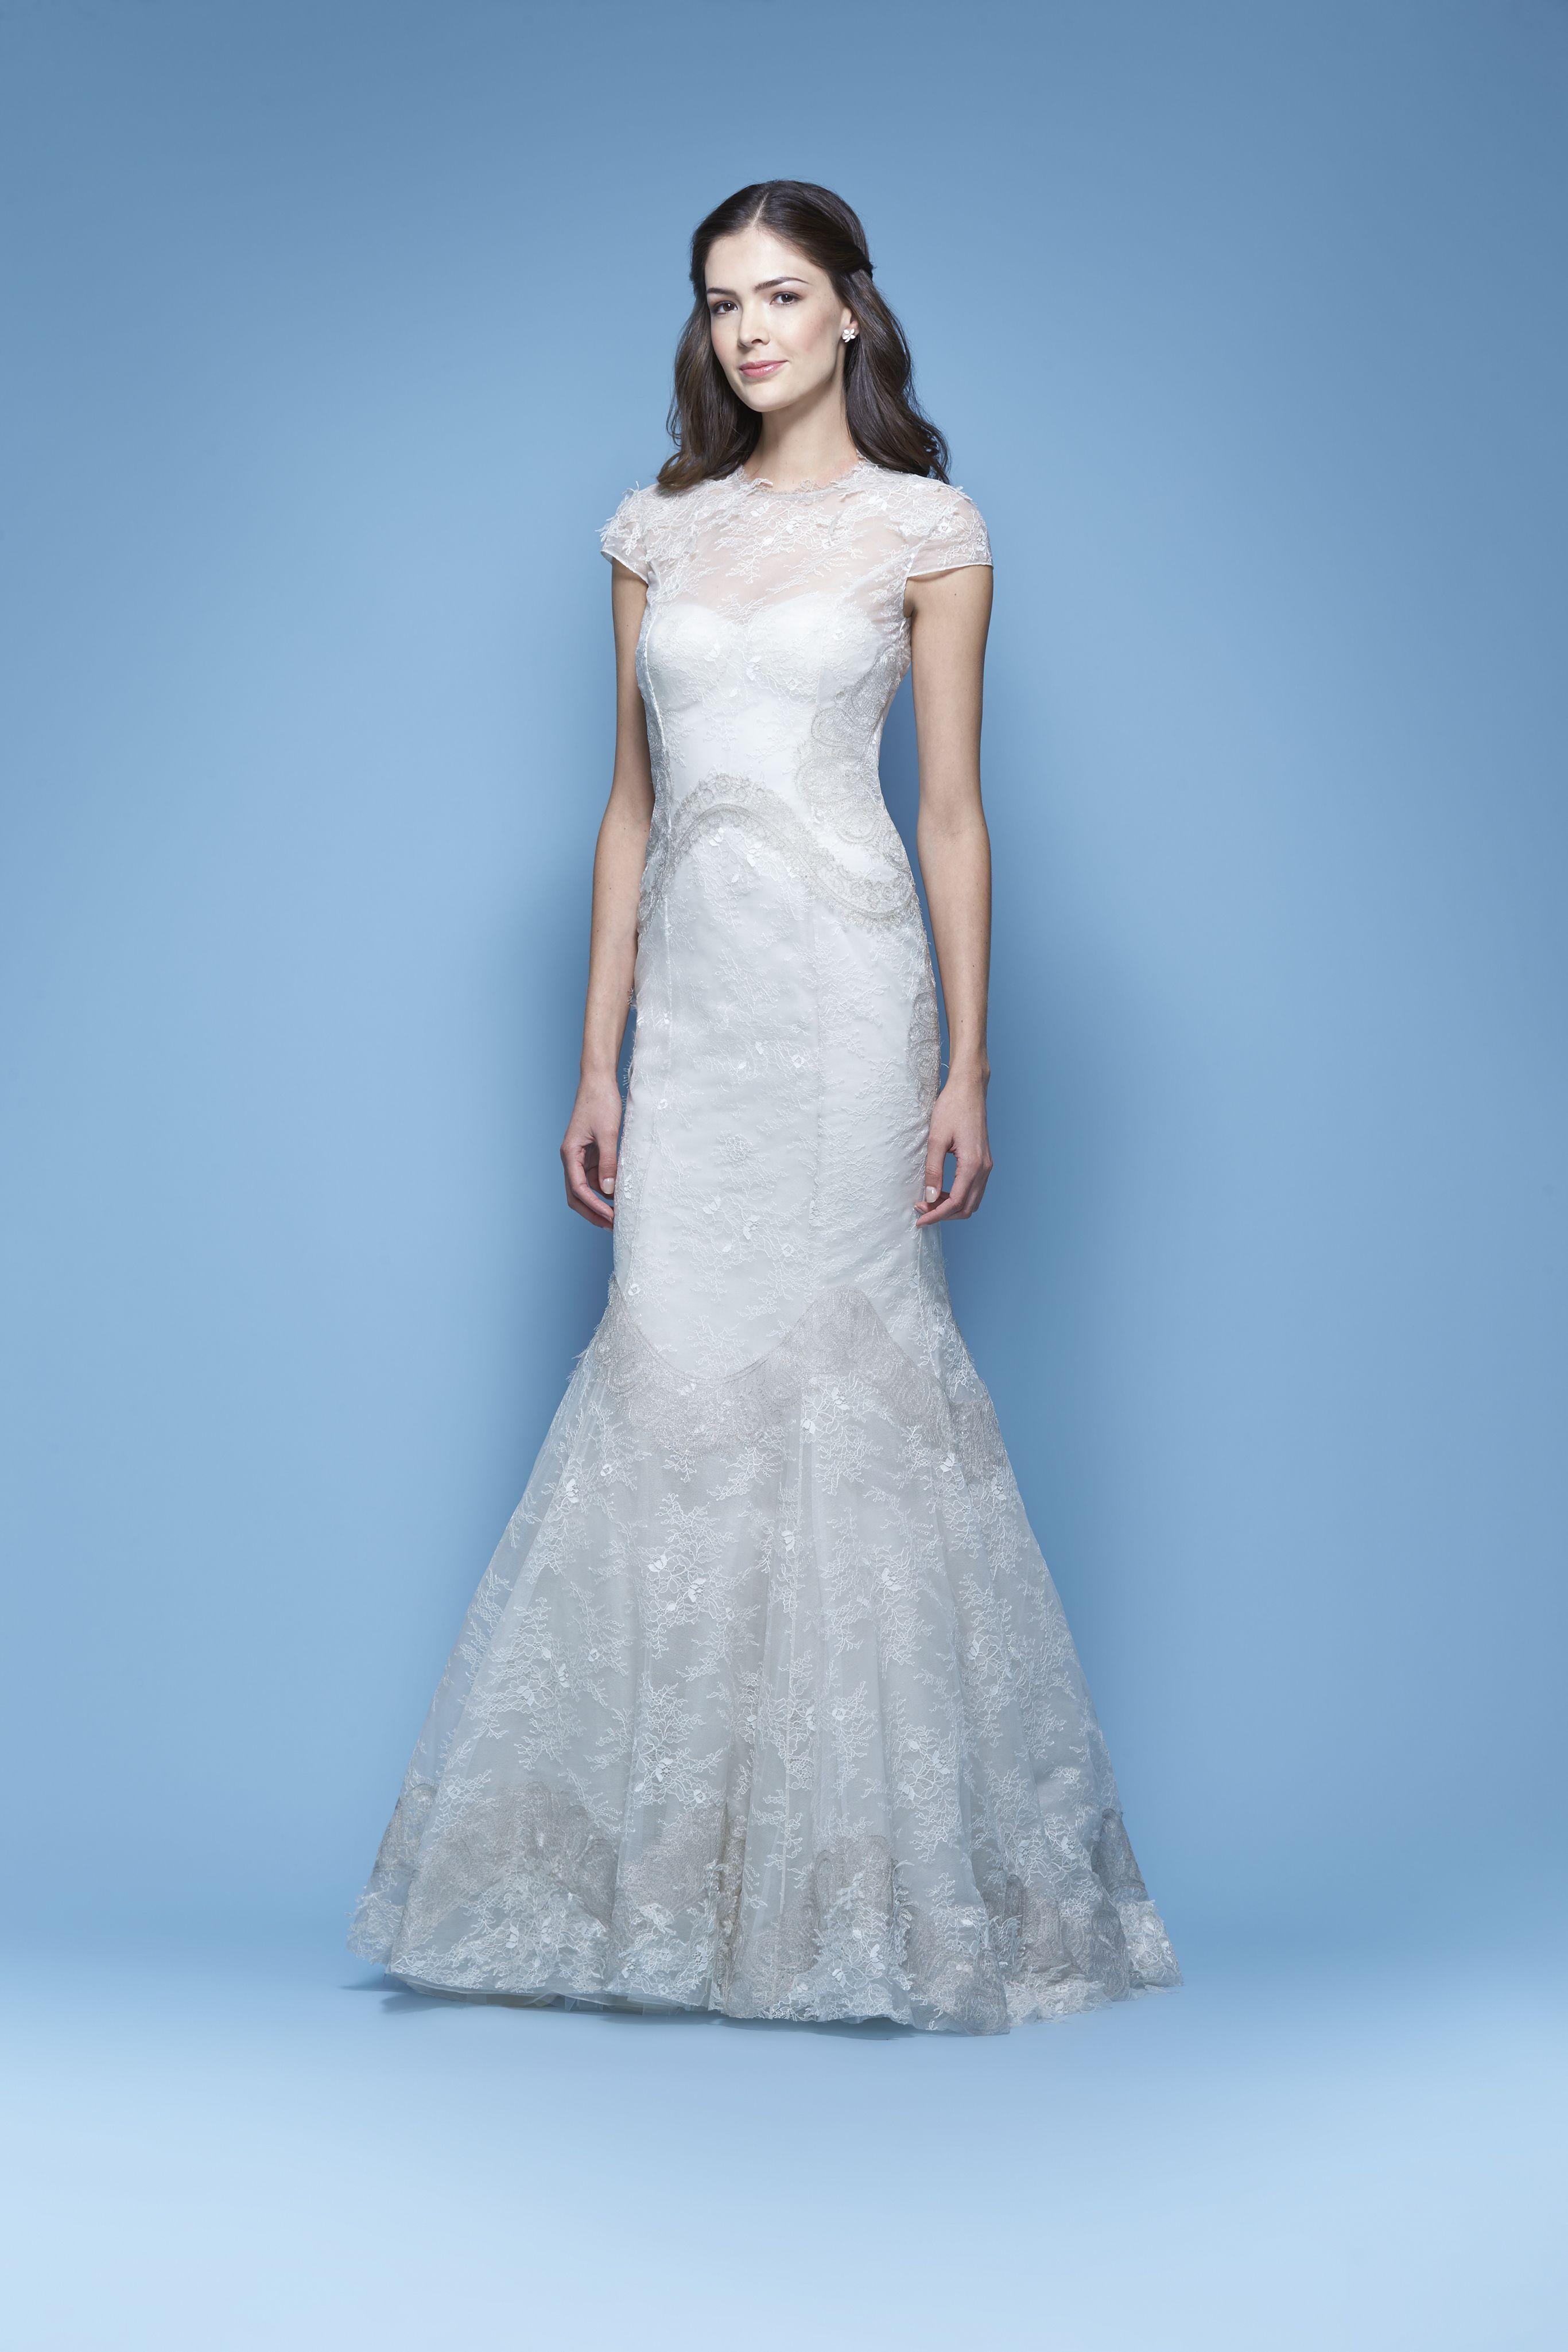 Modern Saks Bridal Gowns Ideas - All Wedding Dresses ...